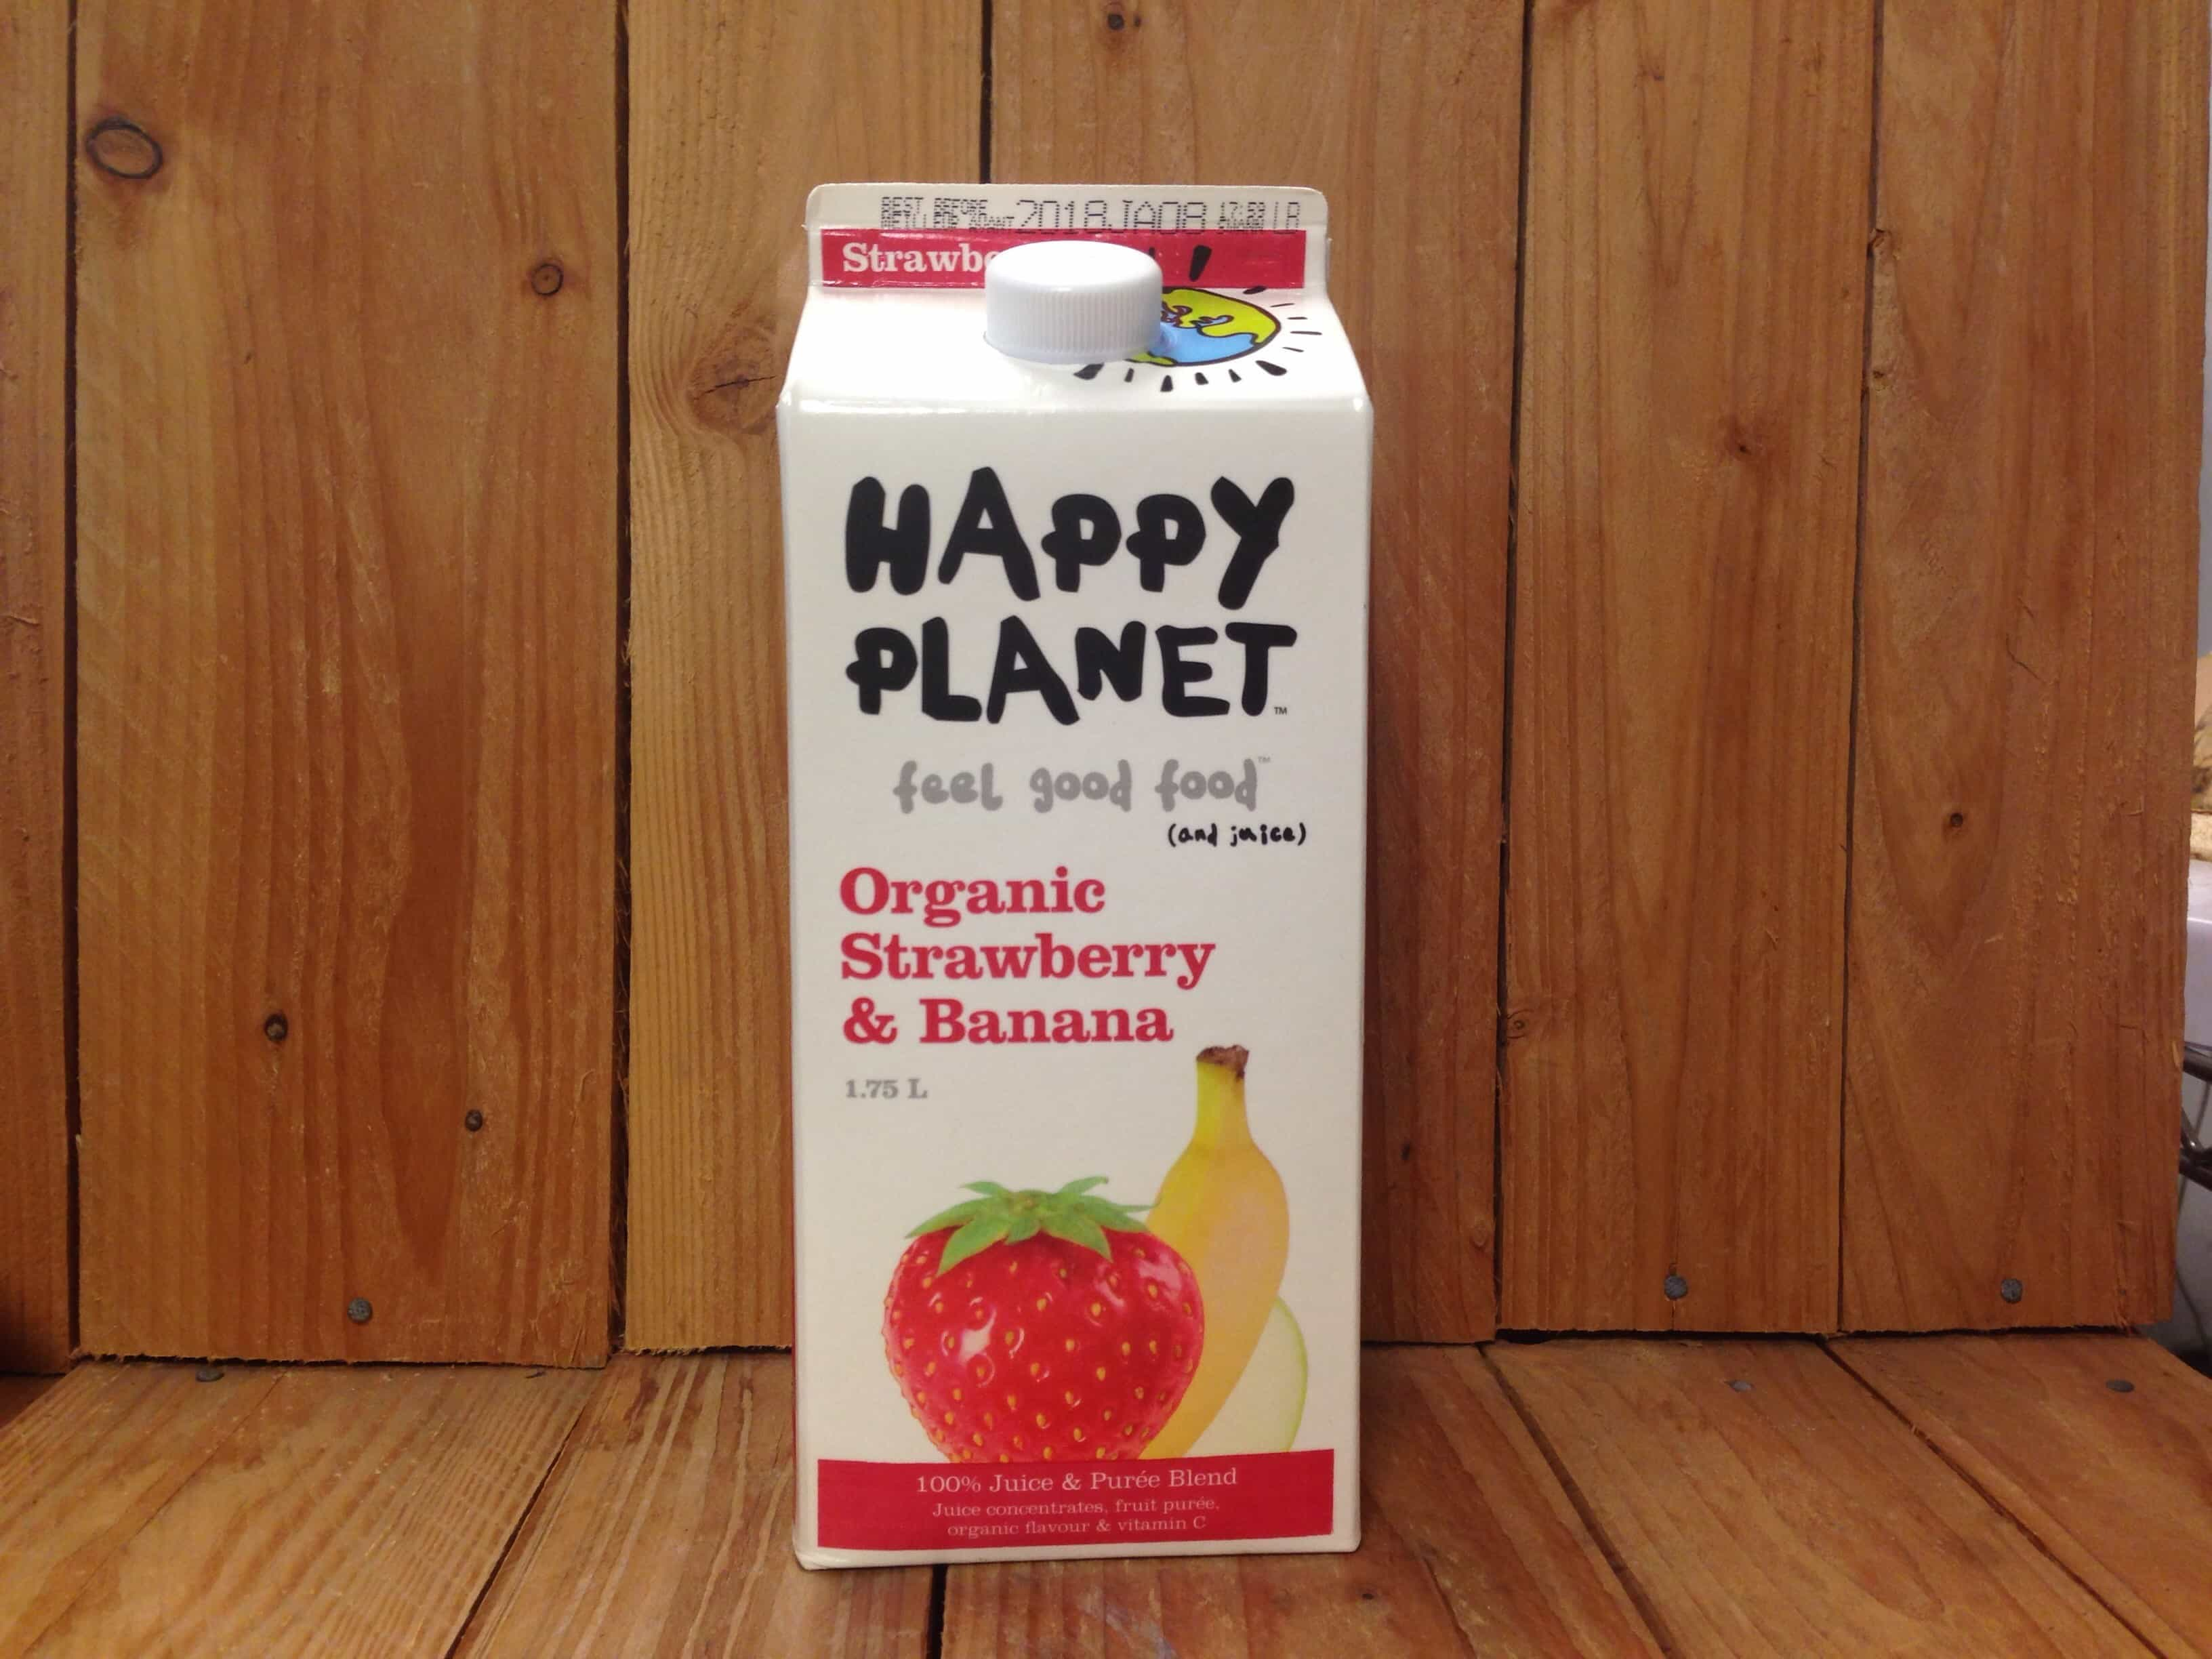 Happy Planet – Organic Strawberry Banana Juice (1.75L Carton)